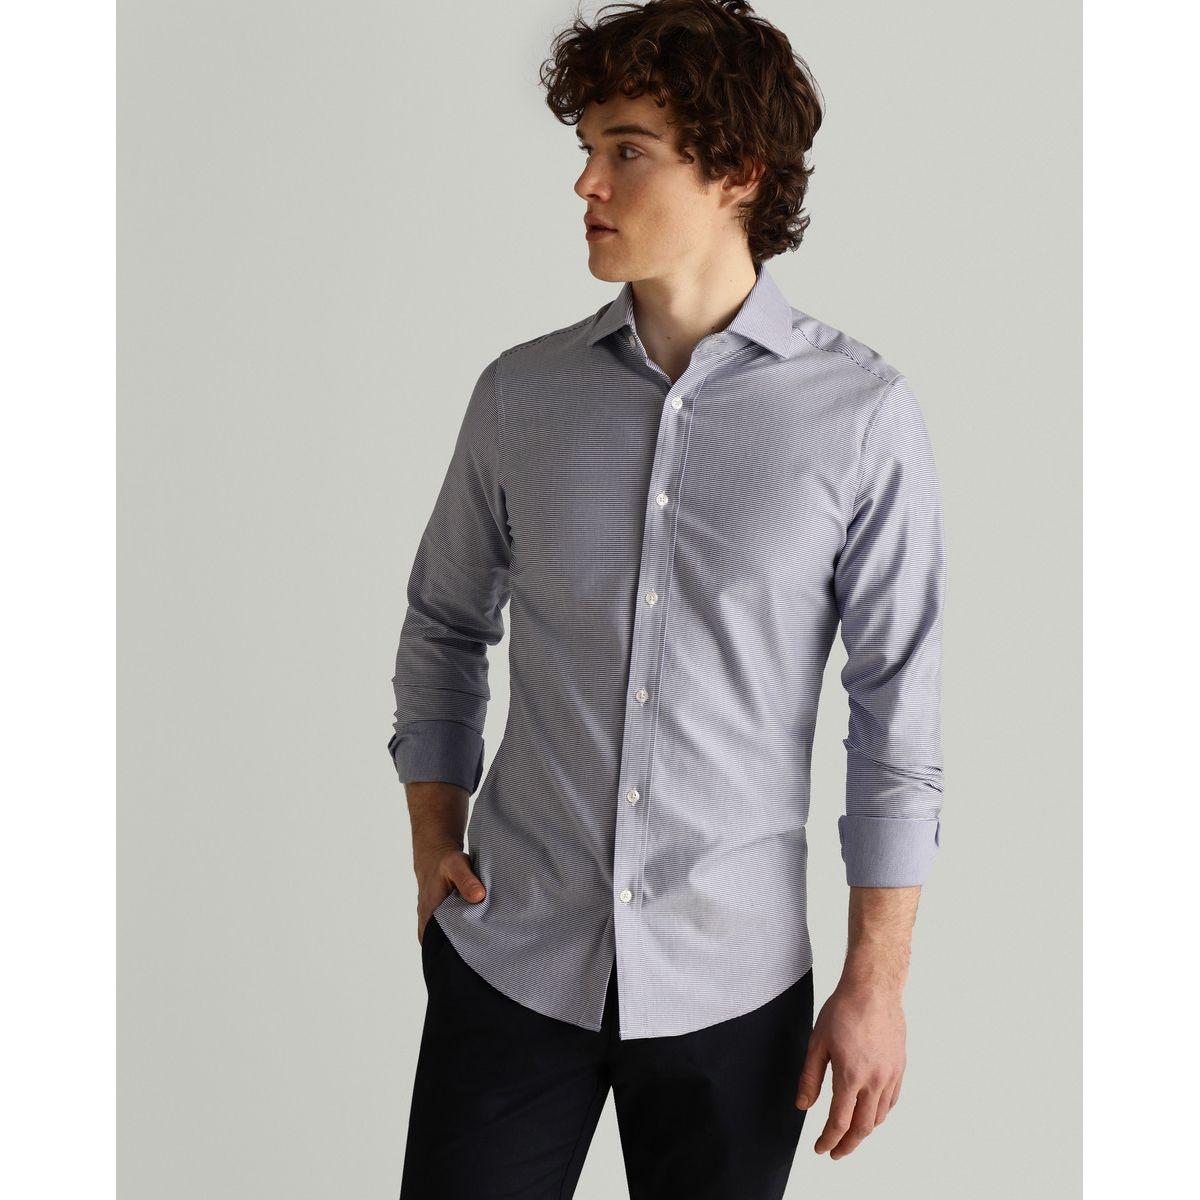 Chemise slim habillée  en maille rayée